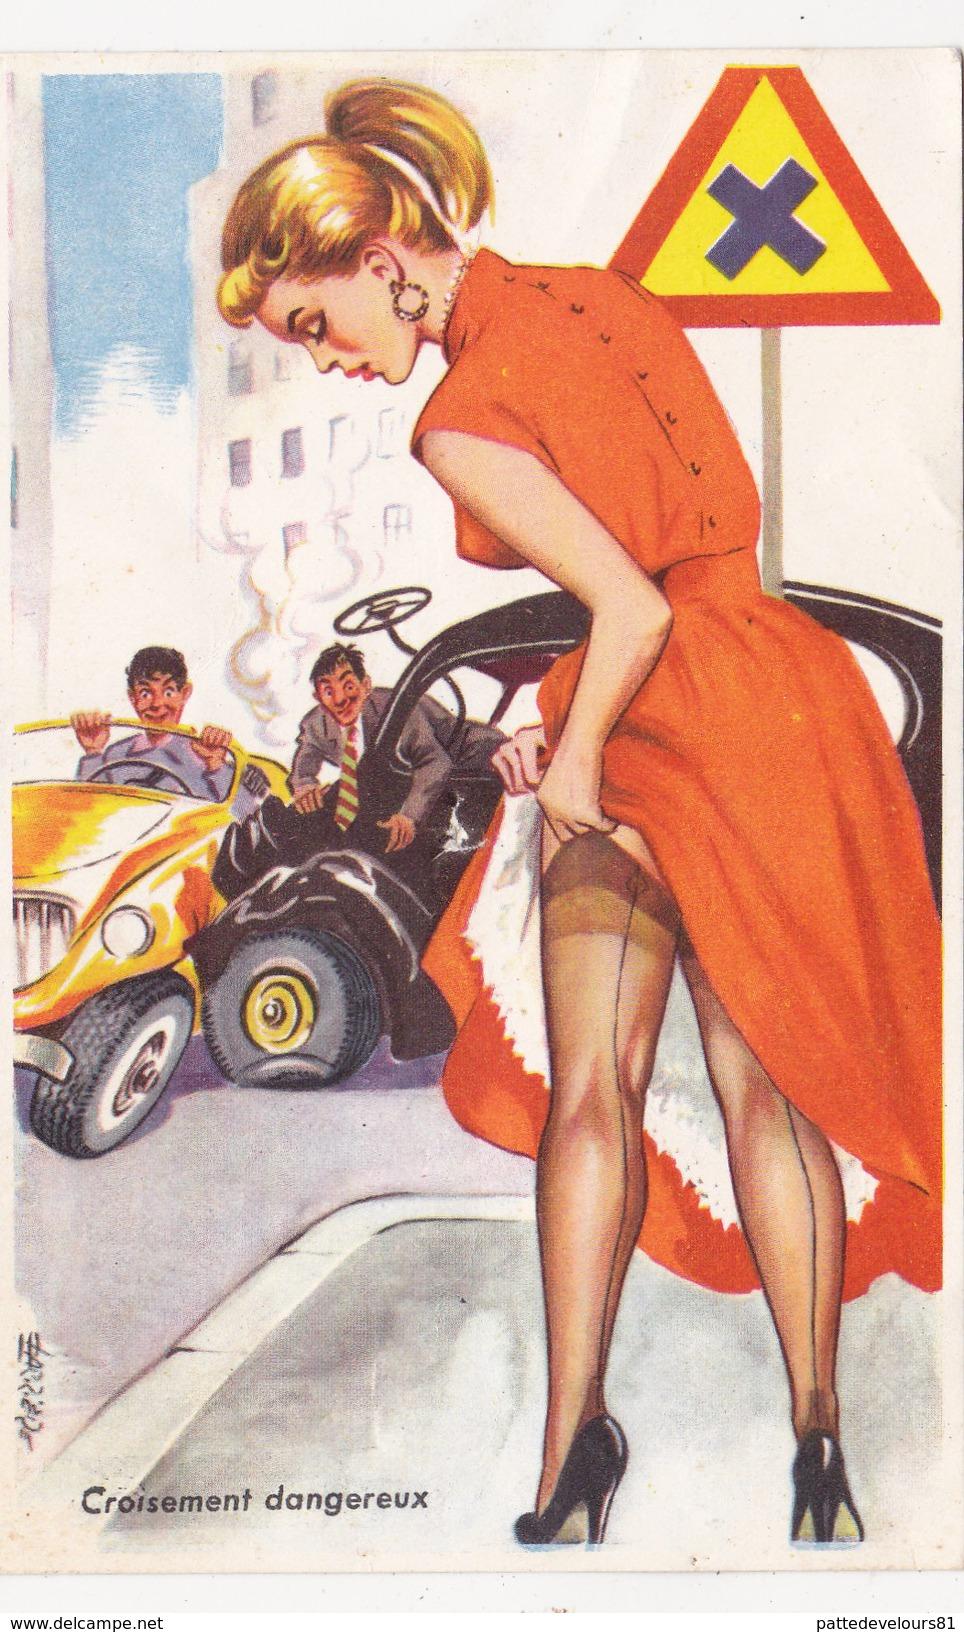 CPSM Accident Voiture Carrefour Dangereux Pin-up Sexy Bas Grivoise Humour Illustrateur CARRIERE N° 374 - Carrière, Louis